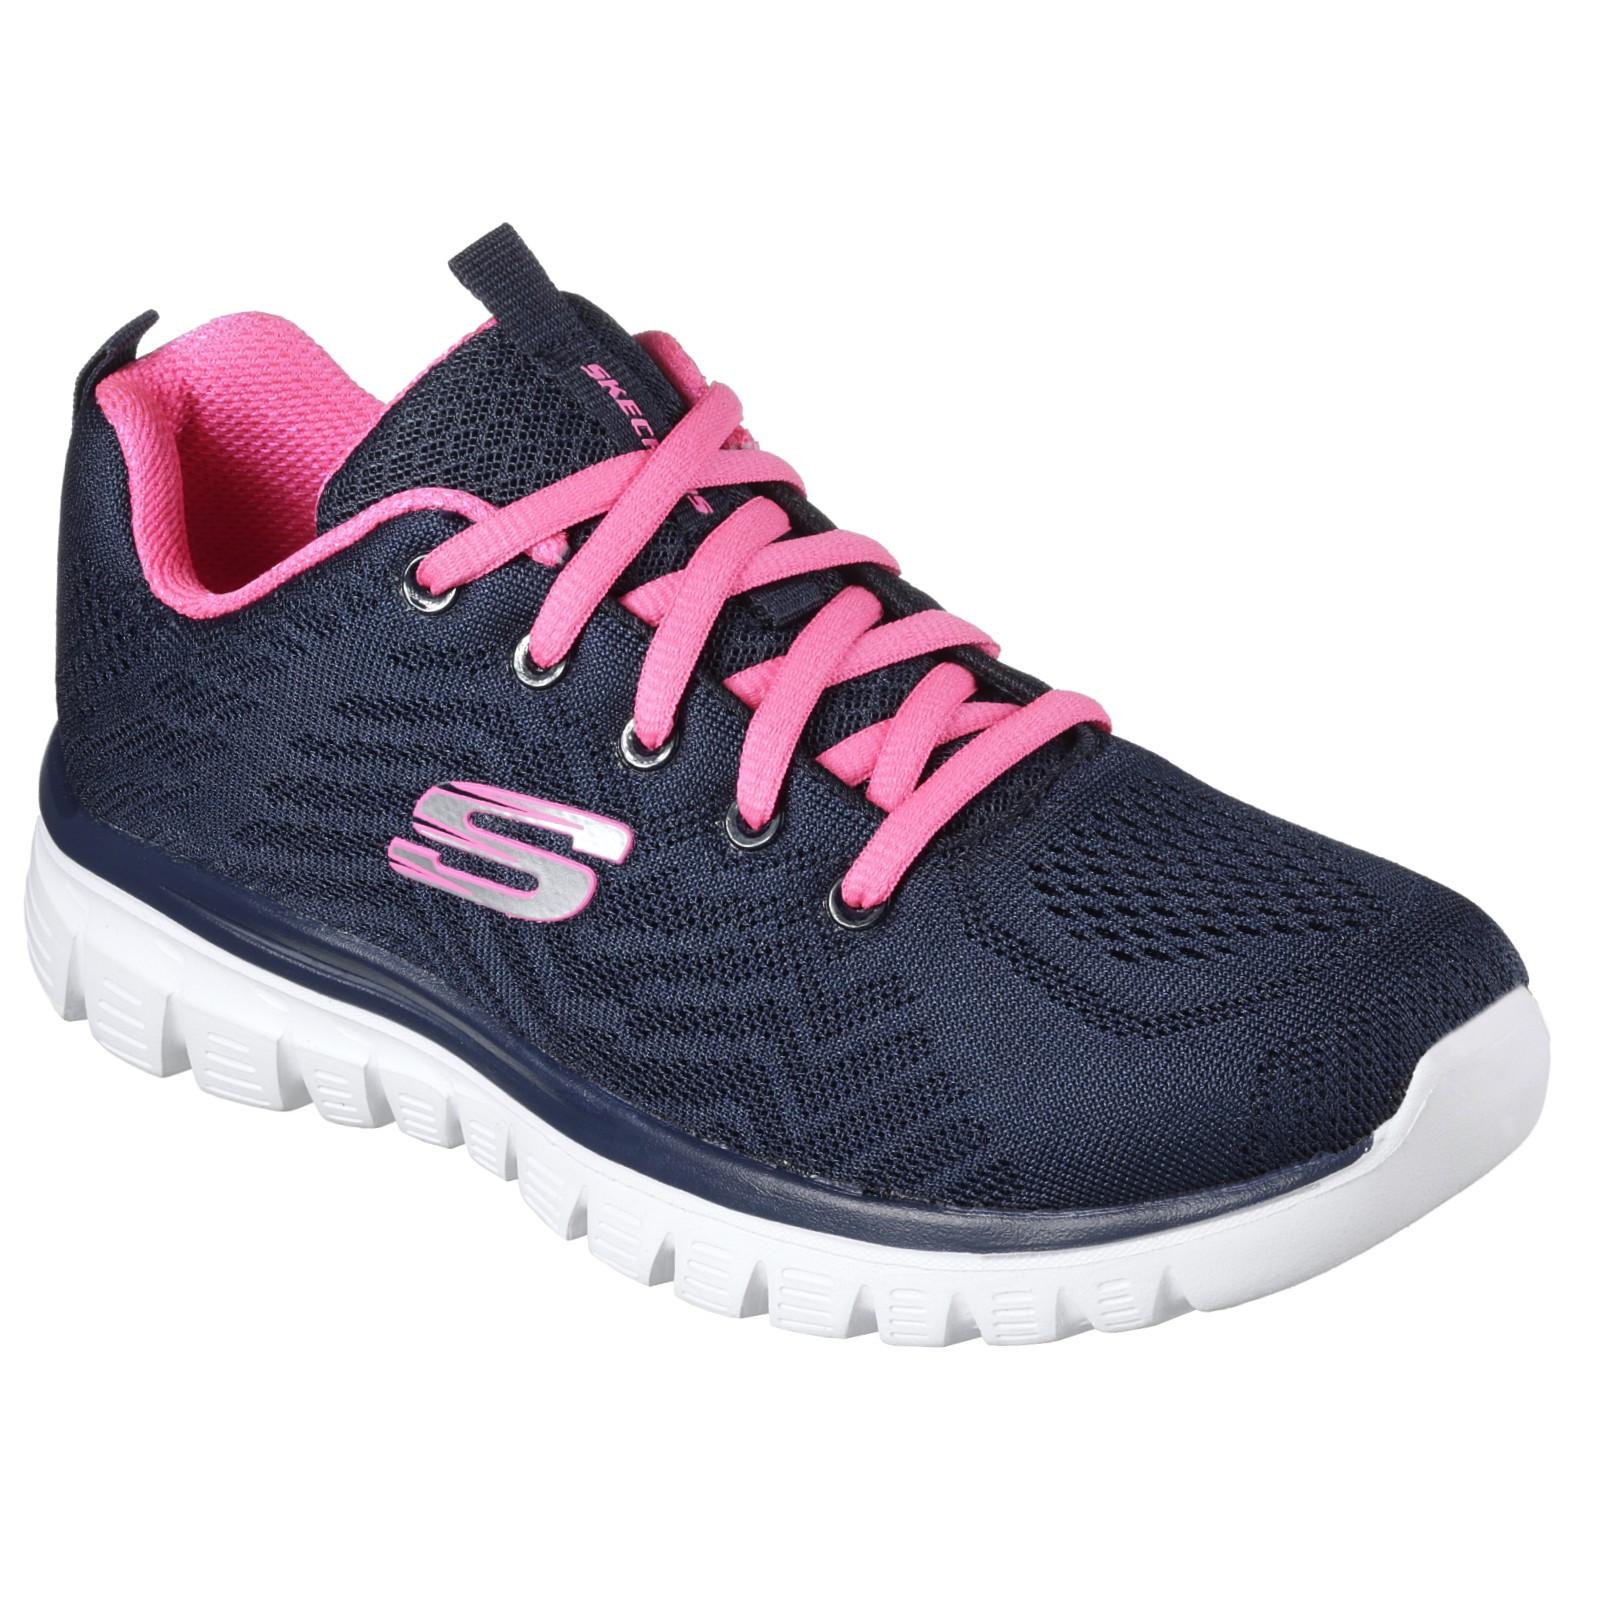 Skechers Graceful Get Connected női sportcipő 12615 NVHP